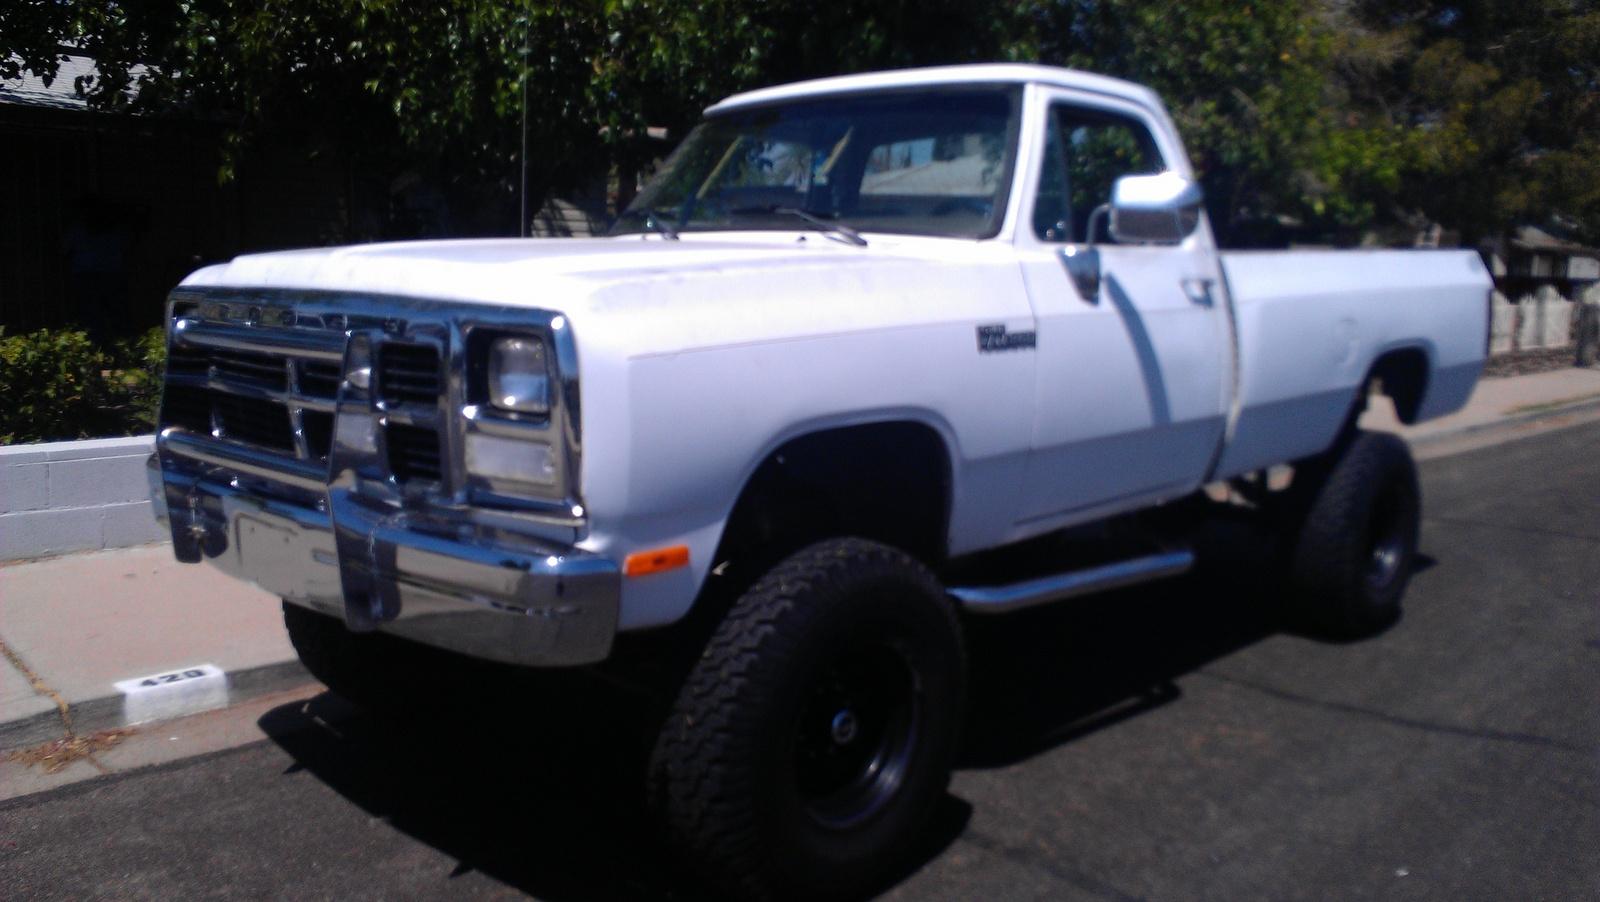 Dodge Ram Dr Le Wd Standard Cab Lb Pic on 1991 Dodge Dynasty Truck